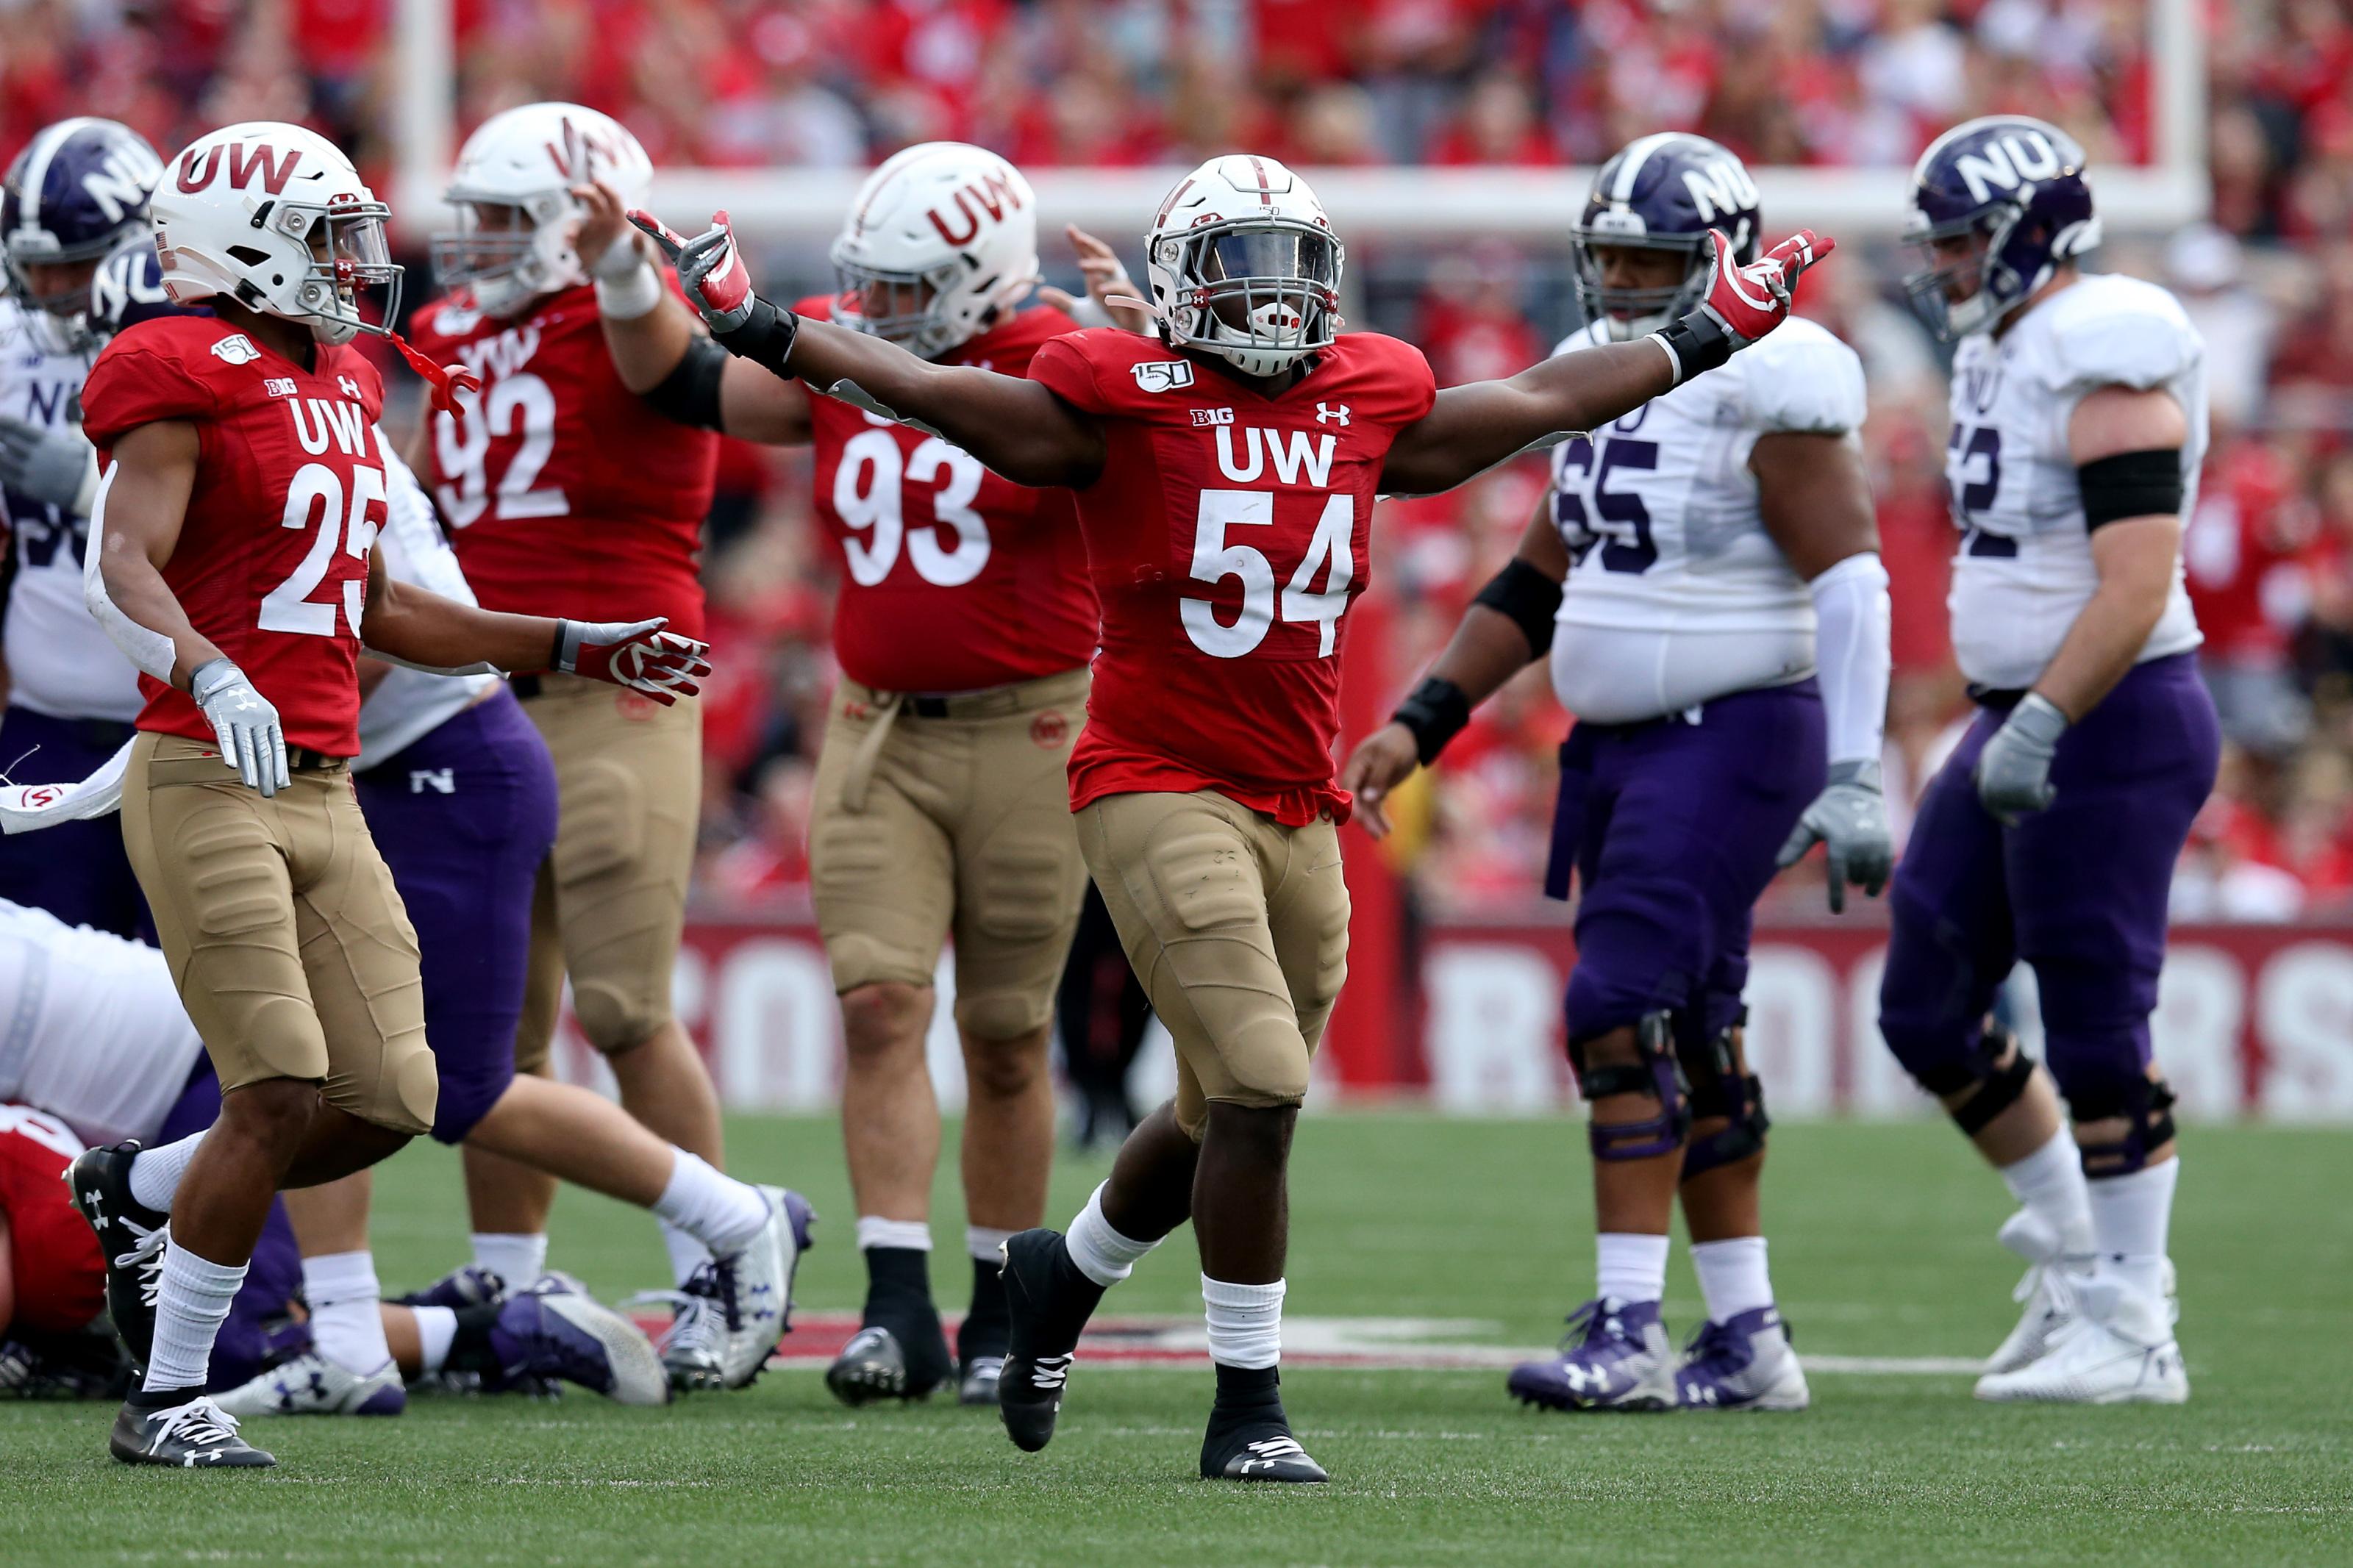 Wisconsin Football v. Northwestern: 3 Big Takeaways